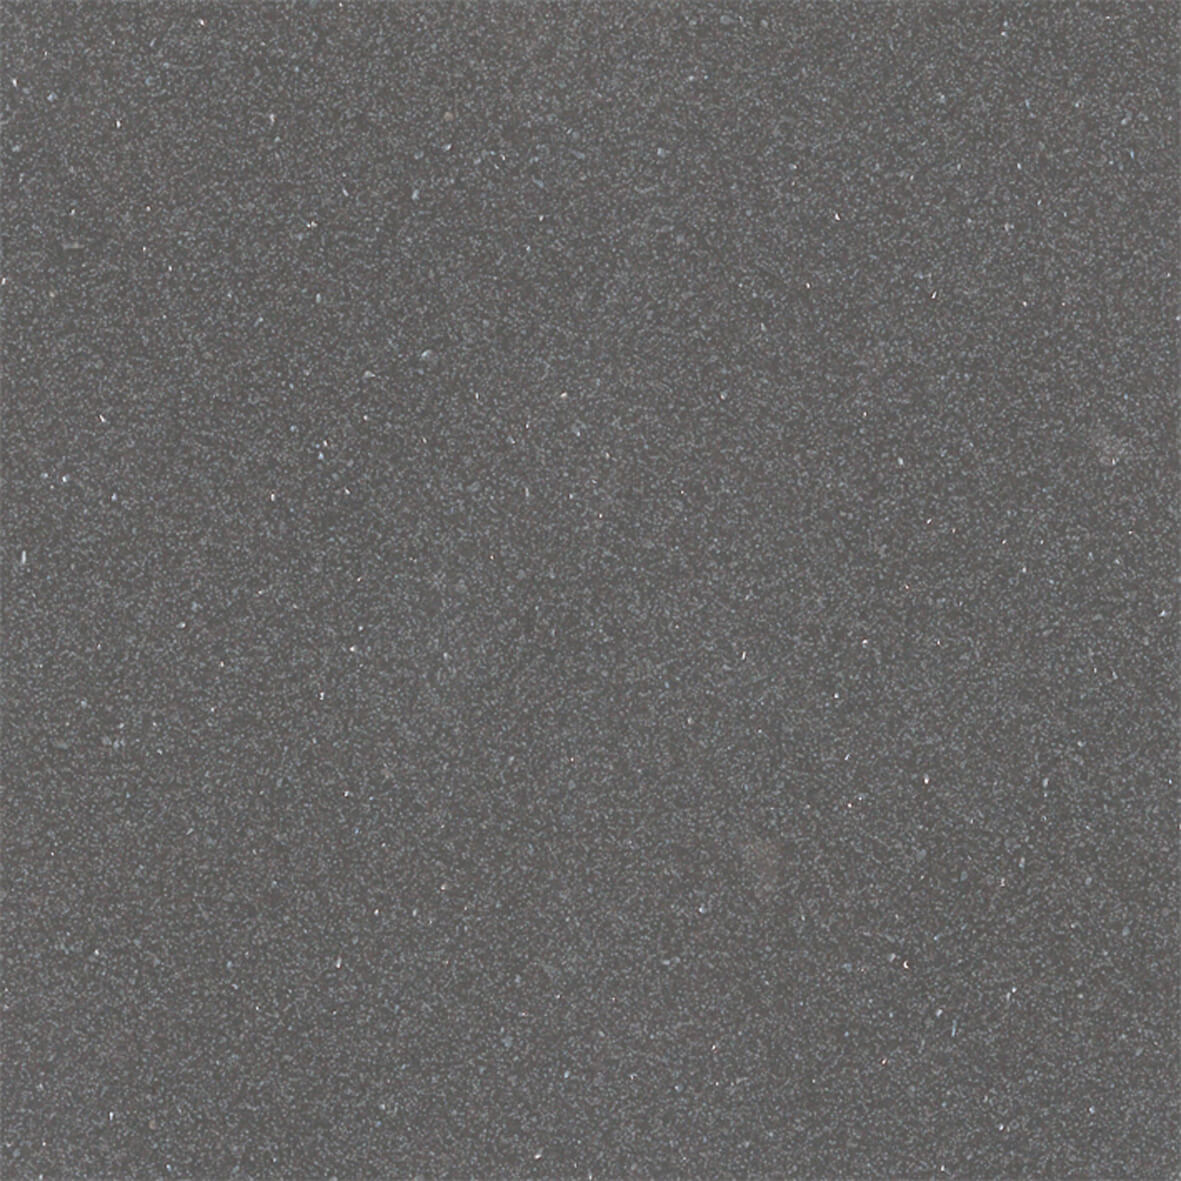 ES582メイン画像イメージ